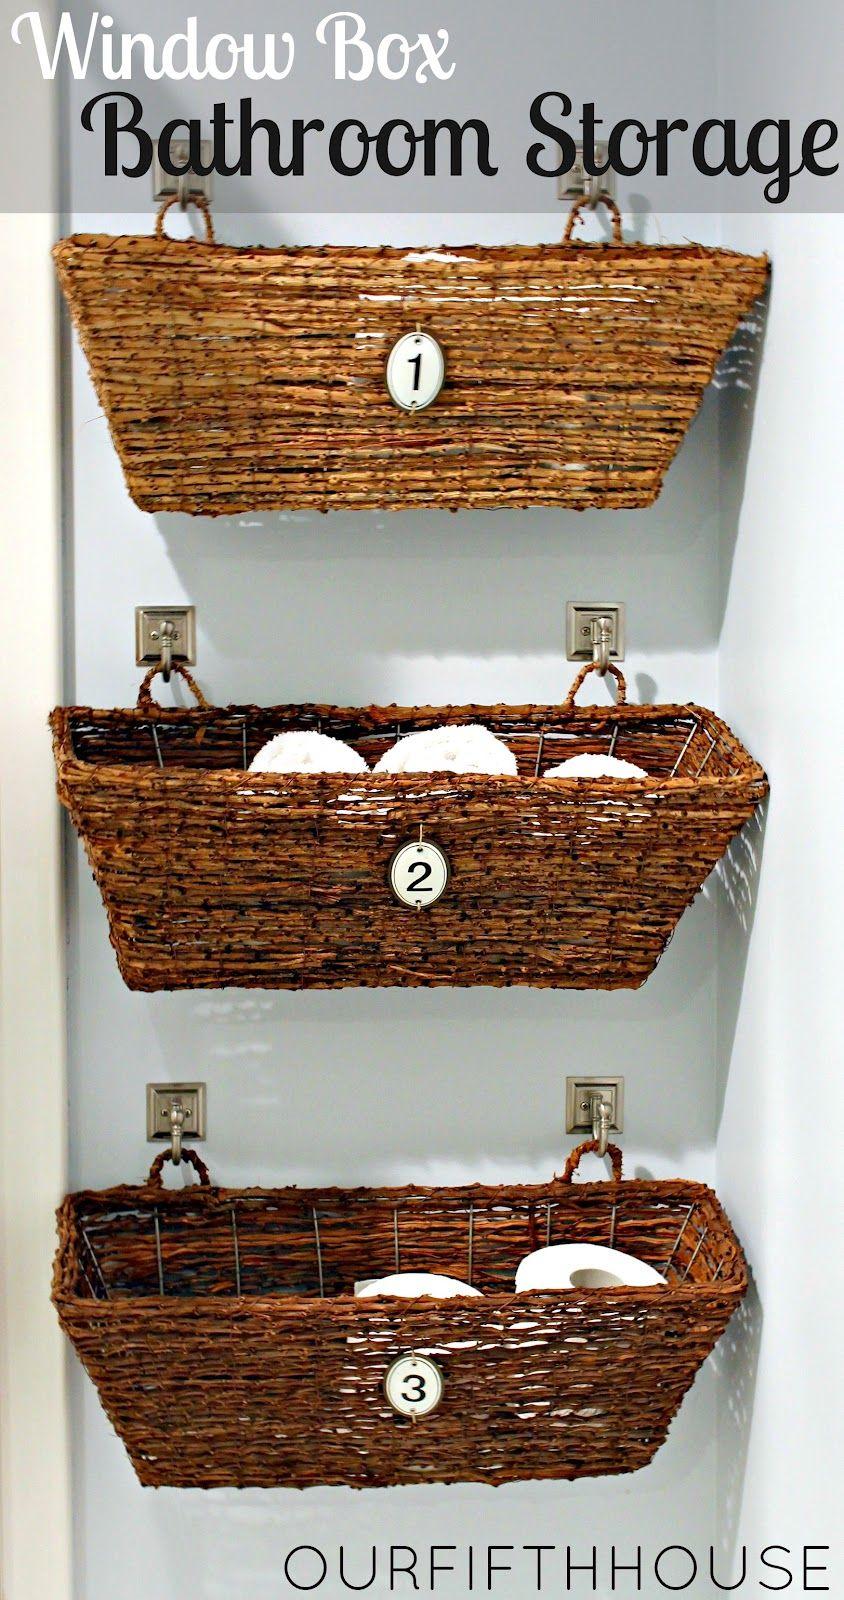 marvellous diy bathroom towel storage ideas   40 Simply Marvelous Bathroom Organization Ideas To Get Rid ...